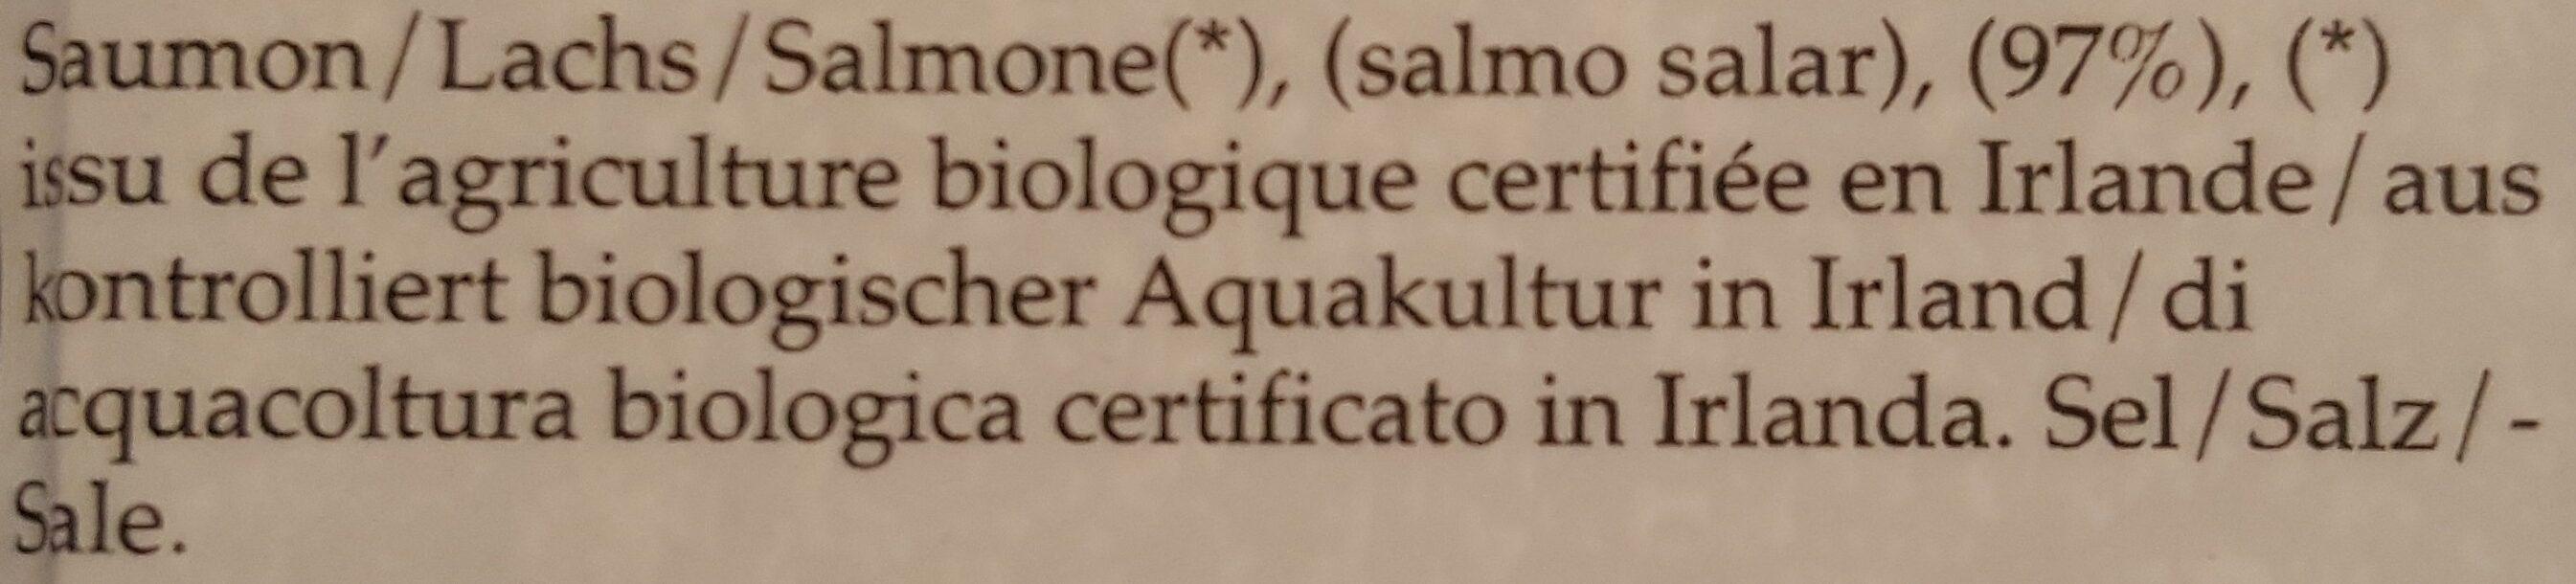 Saumon bio irlandais - Ingrediënten - fr